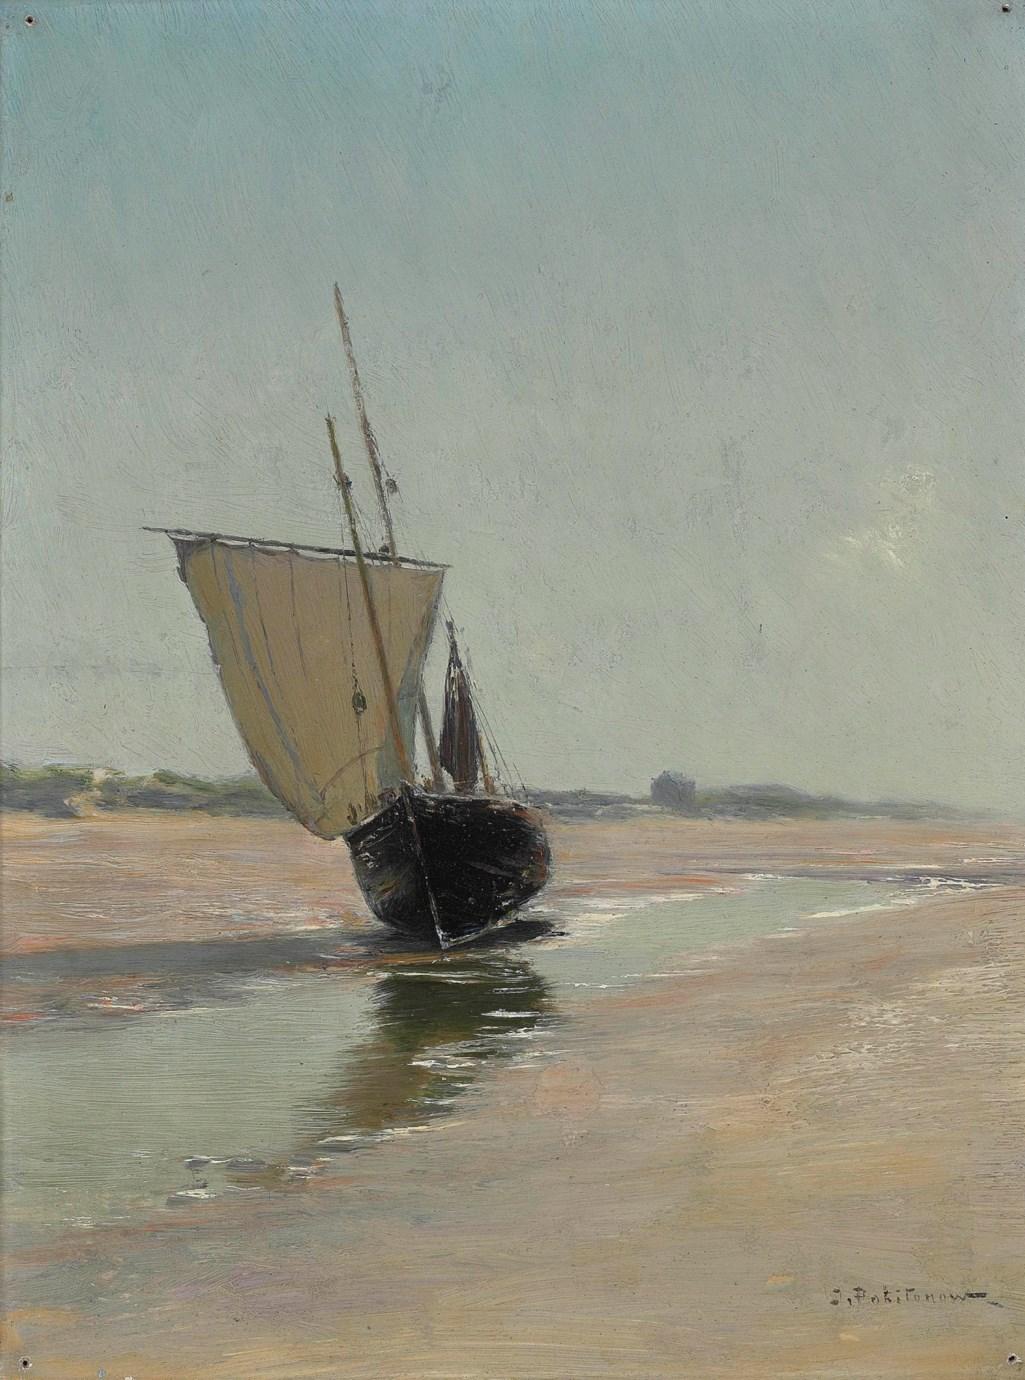 Ivan Pokhitonov (1850-1923) Après la tempête. La Panne / Иван Похитонов (1850-1923) - После бури. Ля - Панн